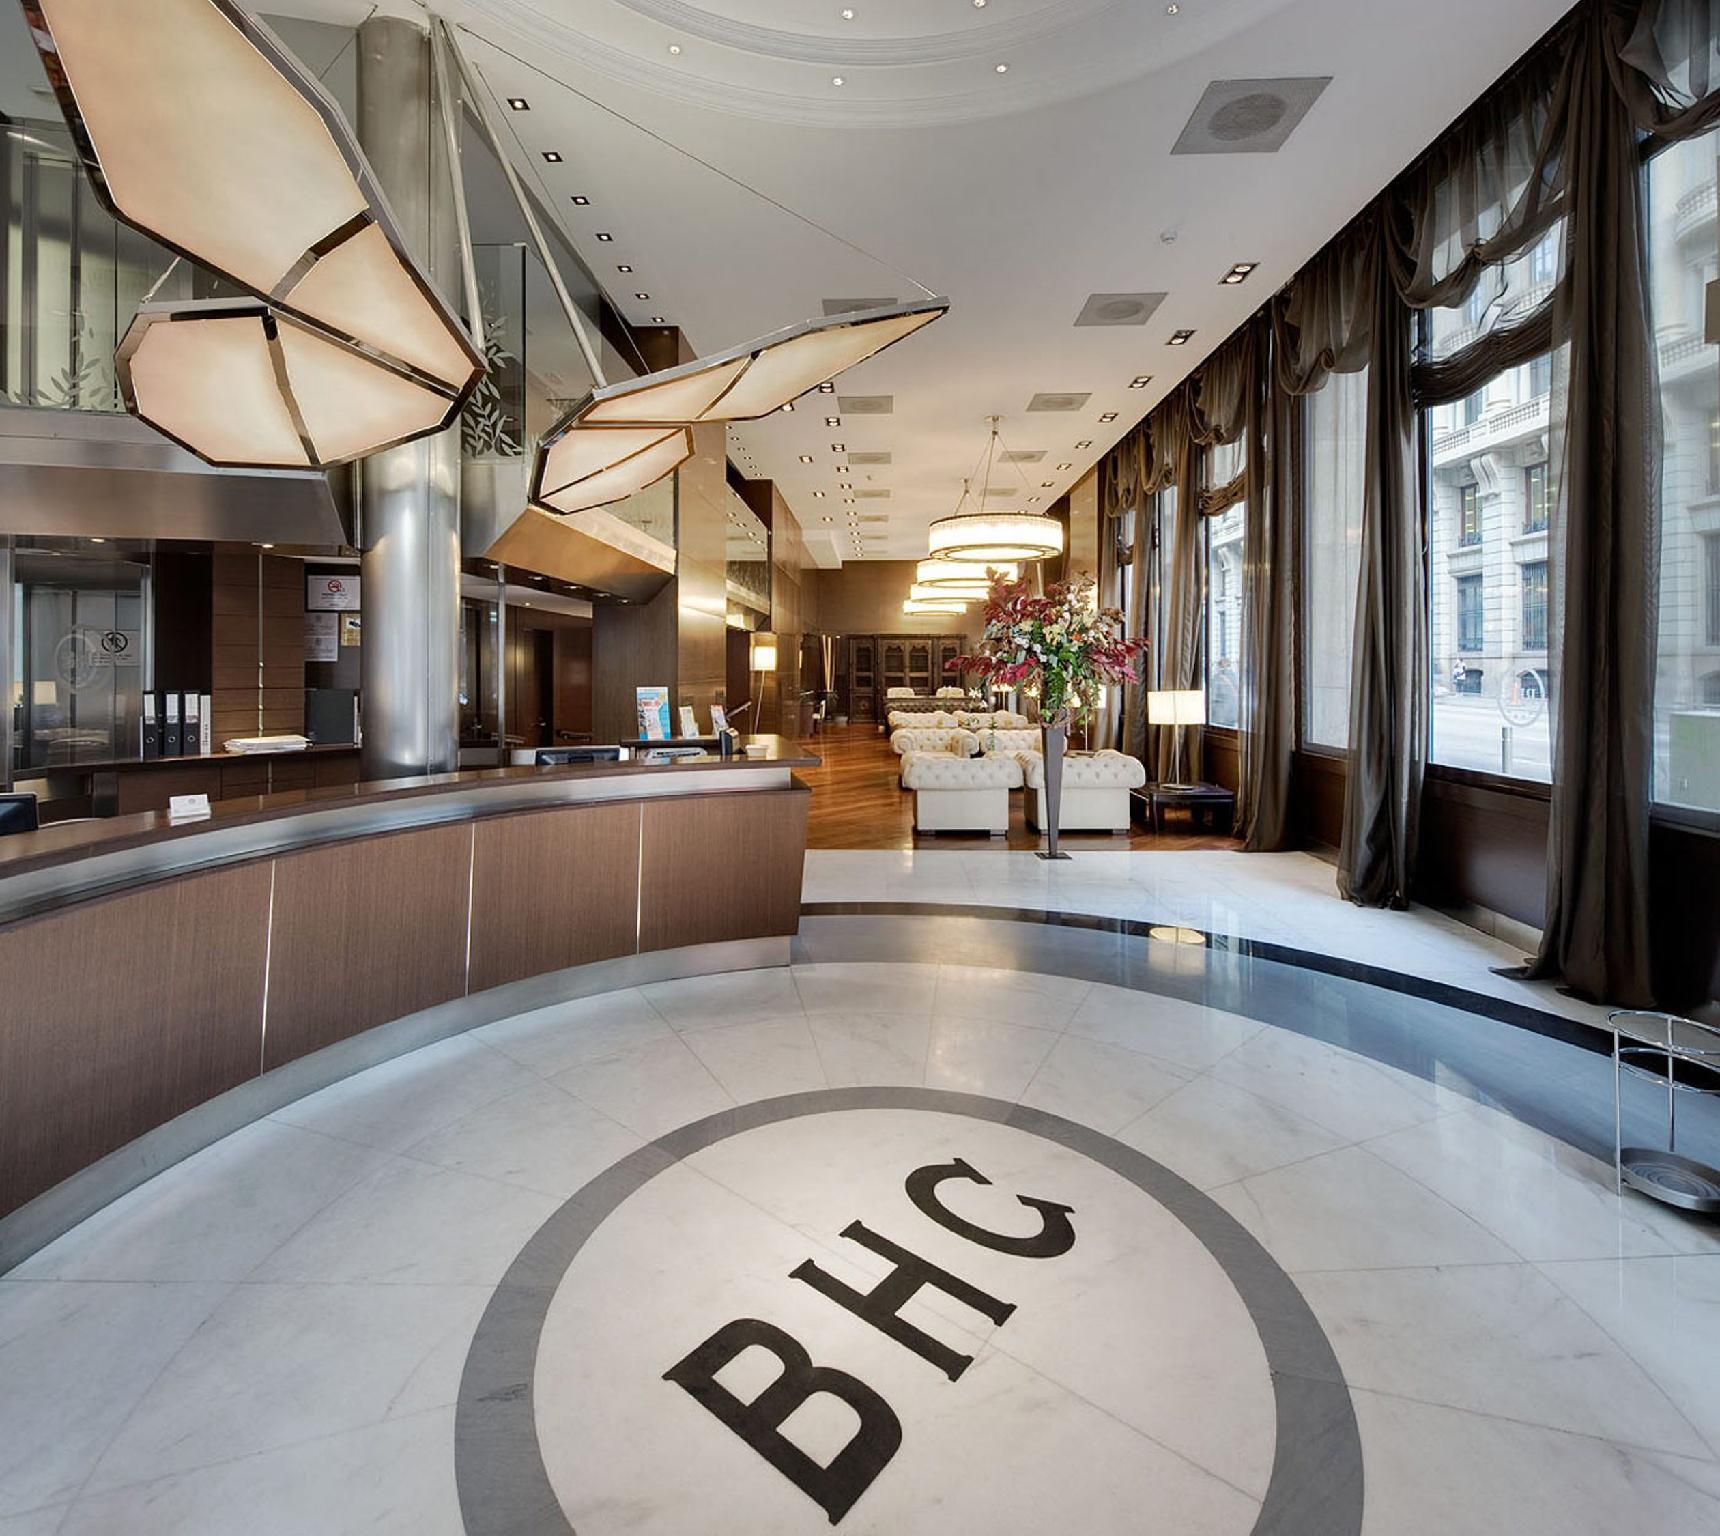 Barcelona Colonial Hotel